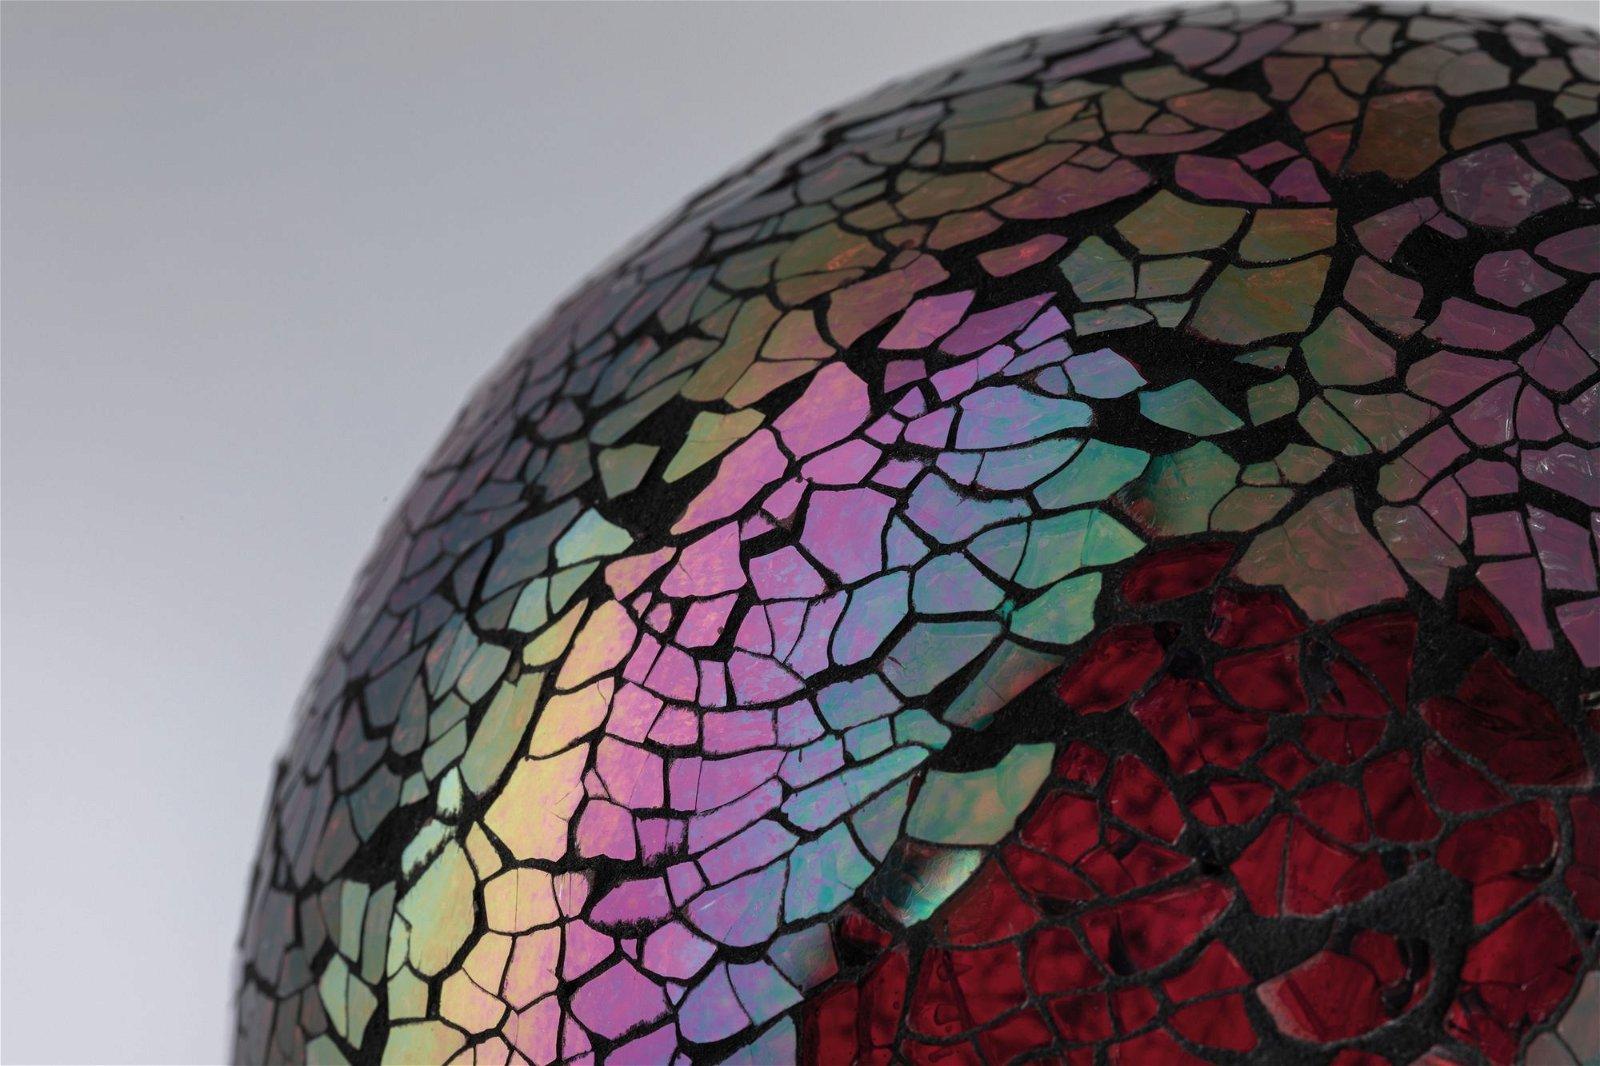 Miracle Mosaic Edition LED Globe E27 230V 470lm 5W 2700K Rot